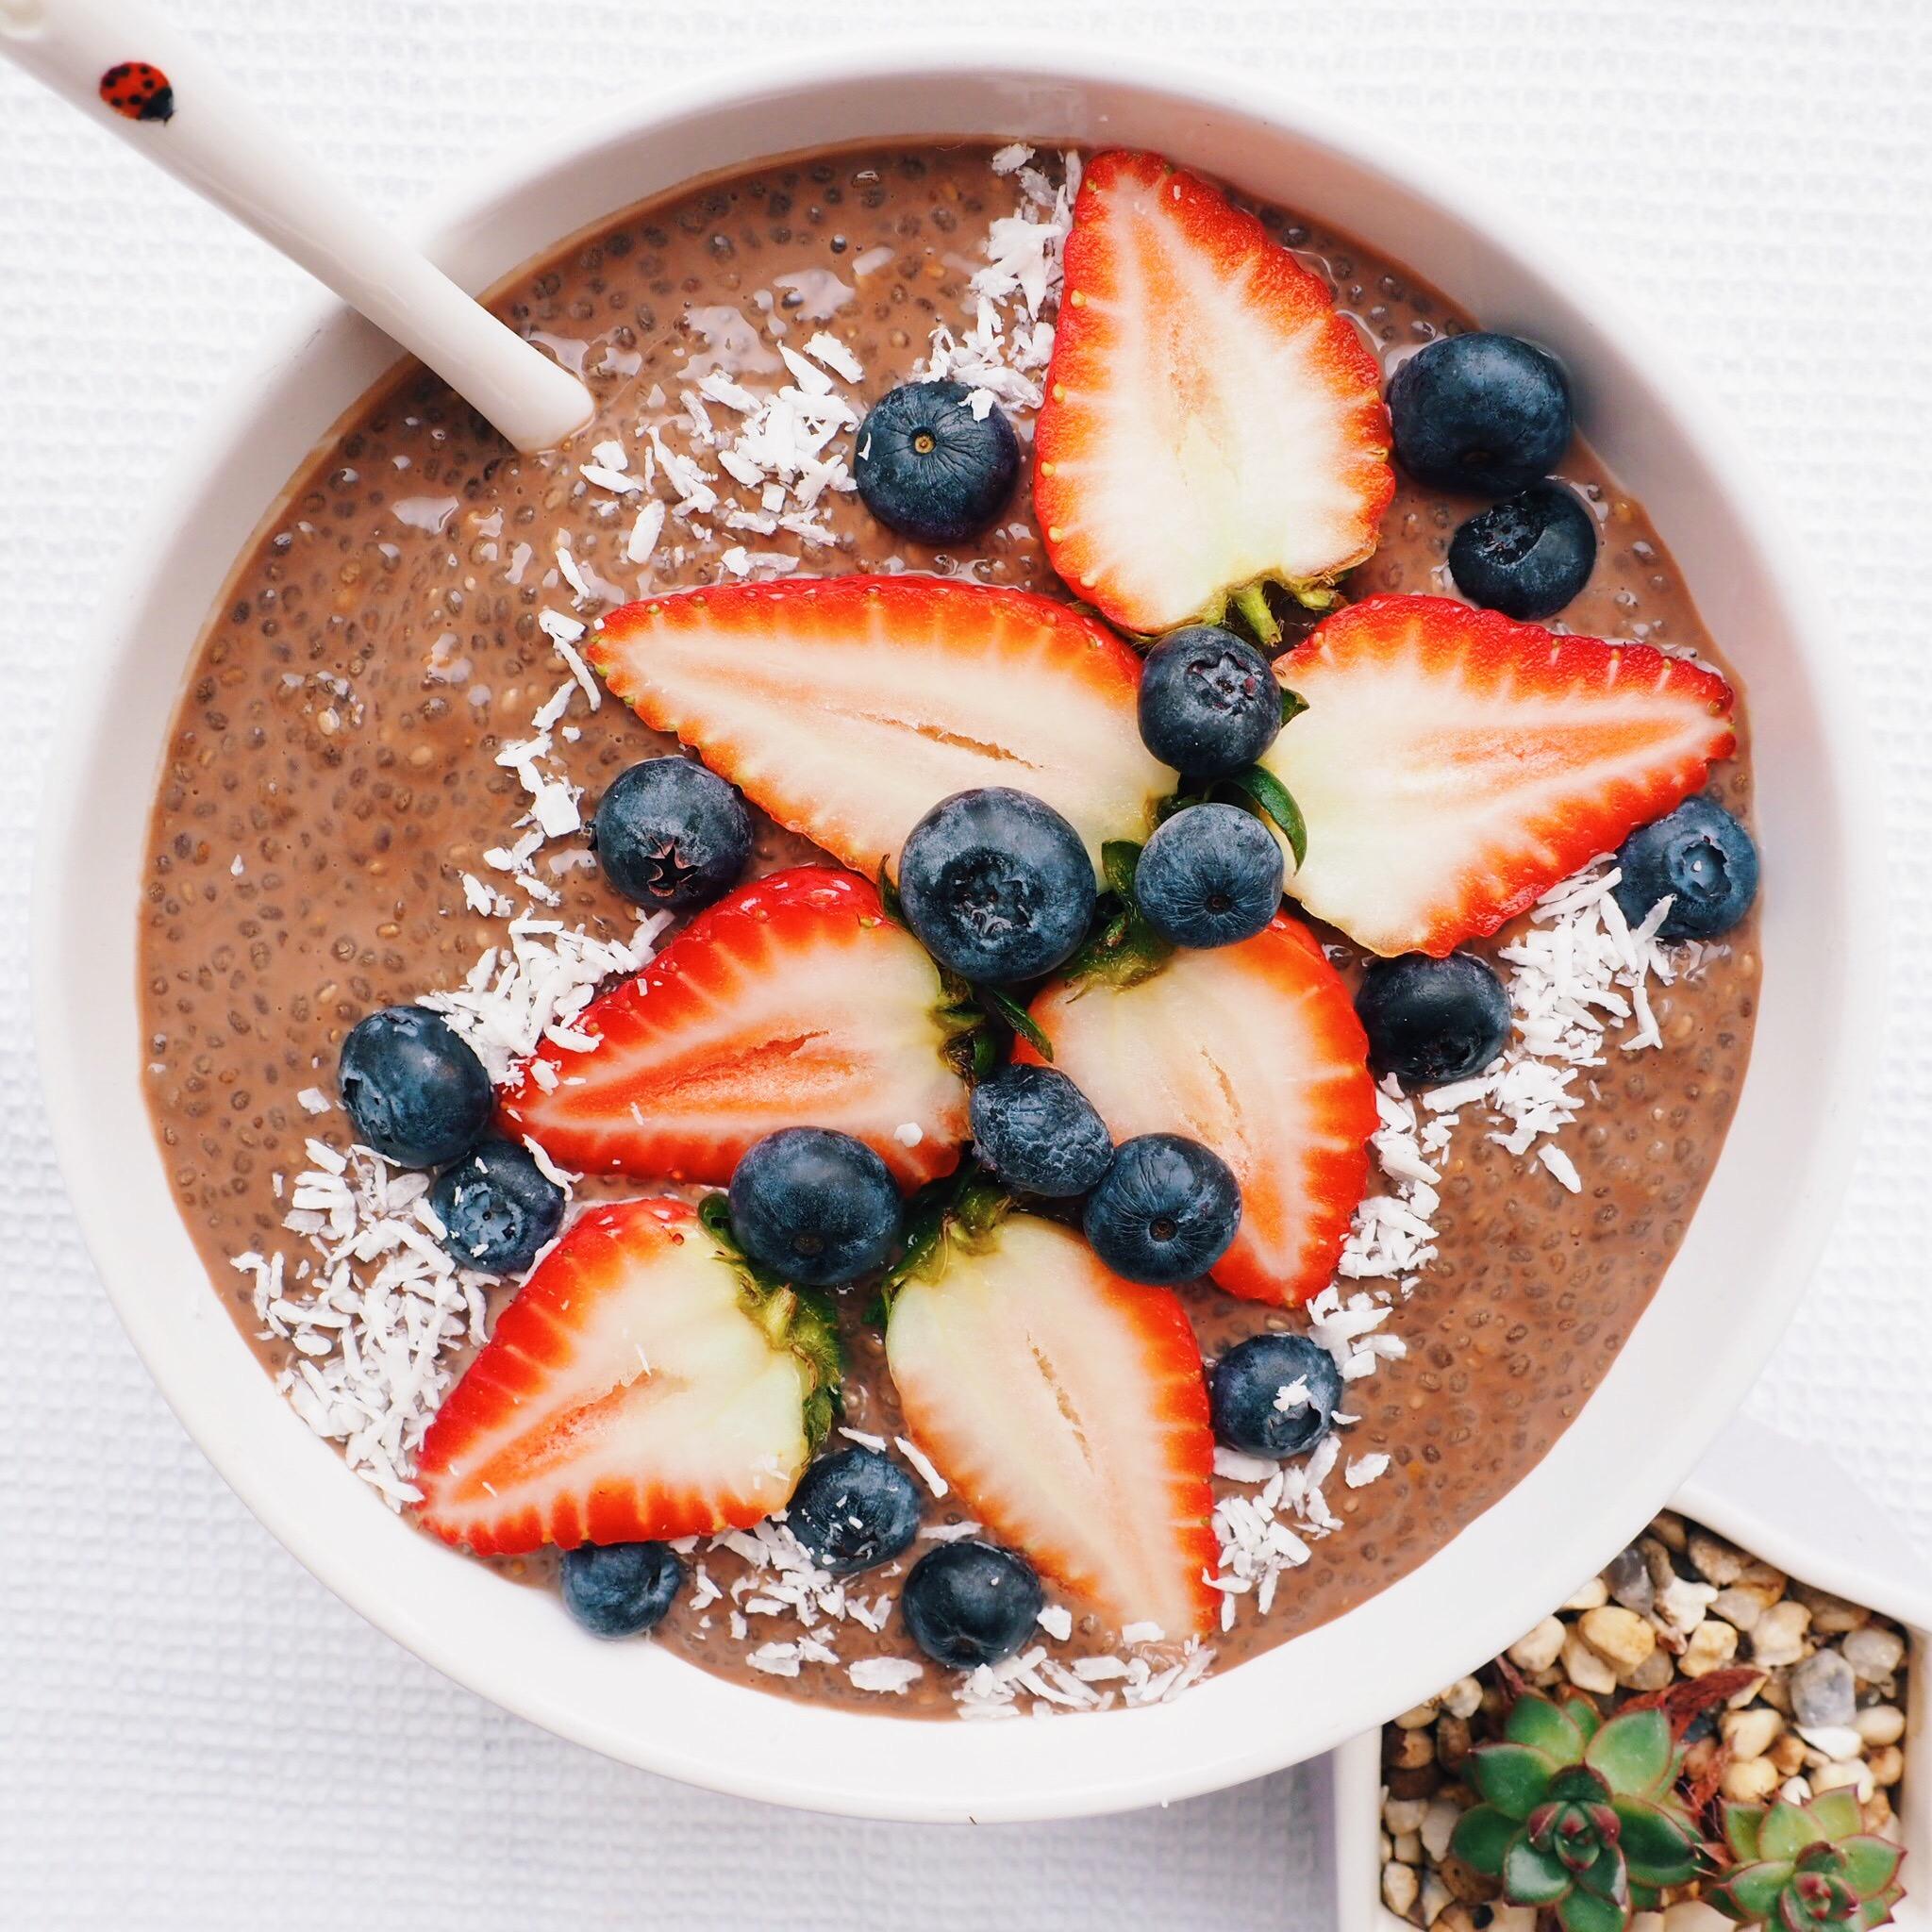 Vegan Chocolate Chia Pudding